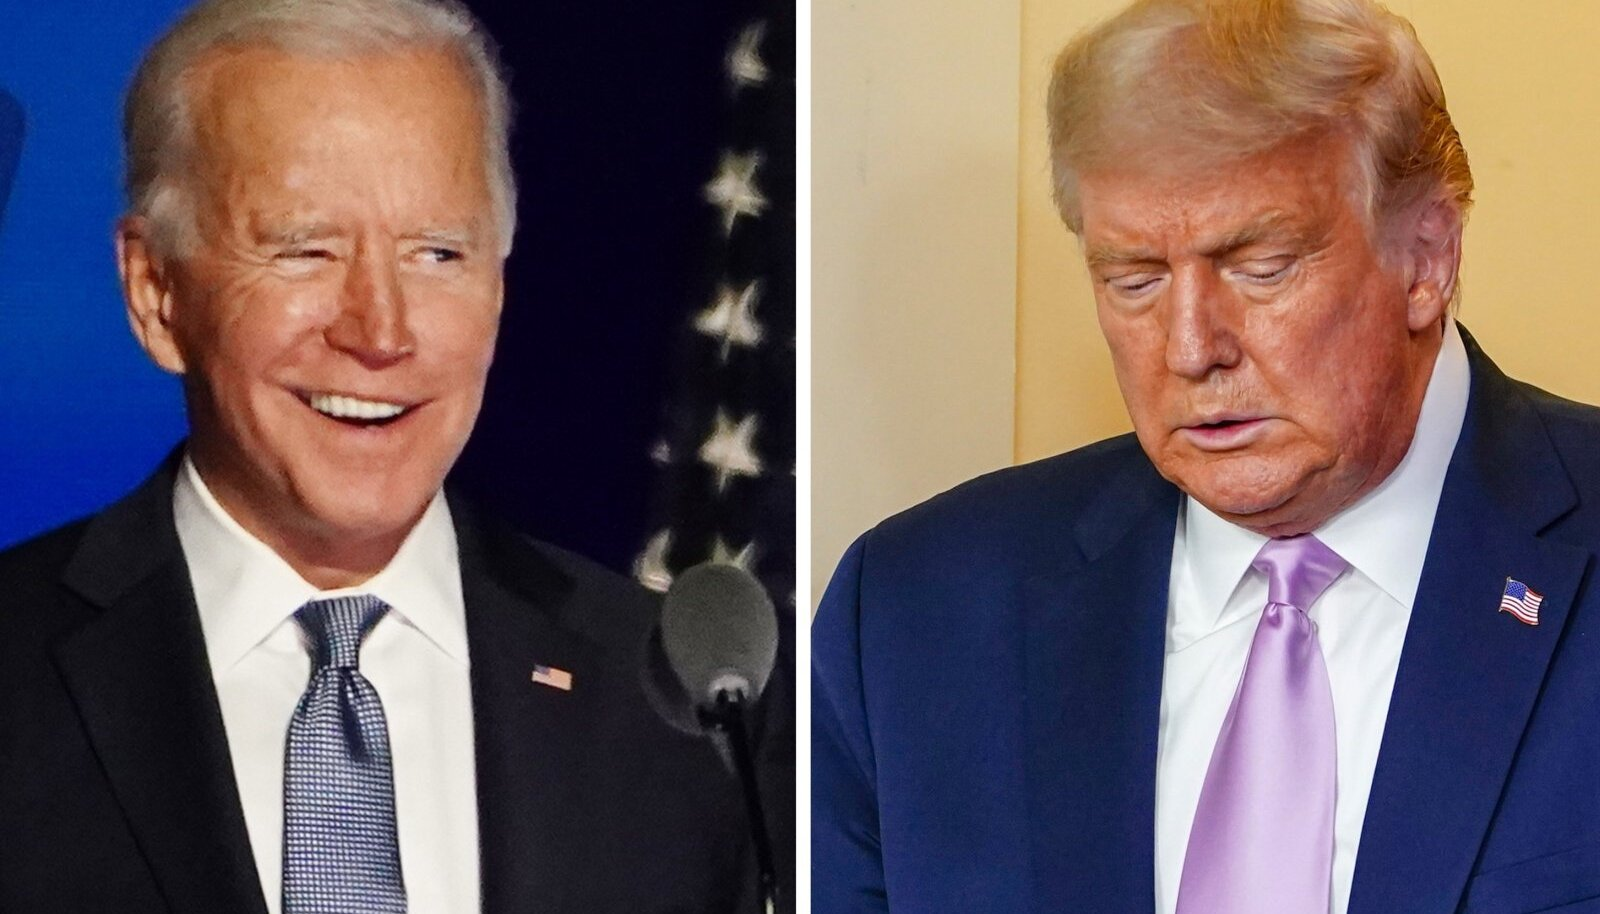 Media report Biden wins 2020 US presidential election